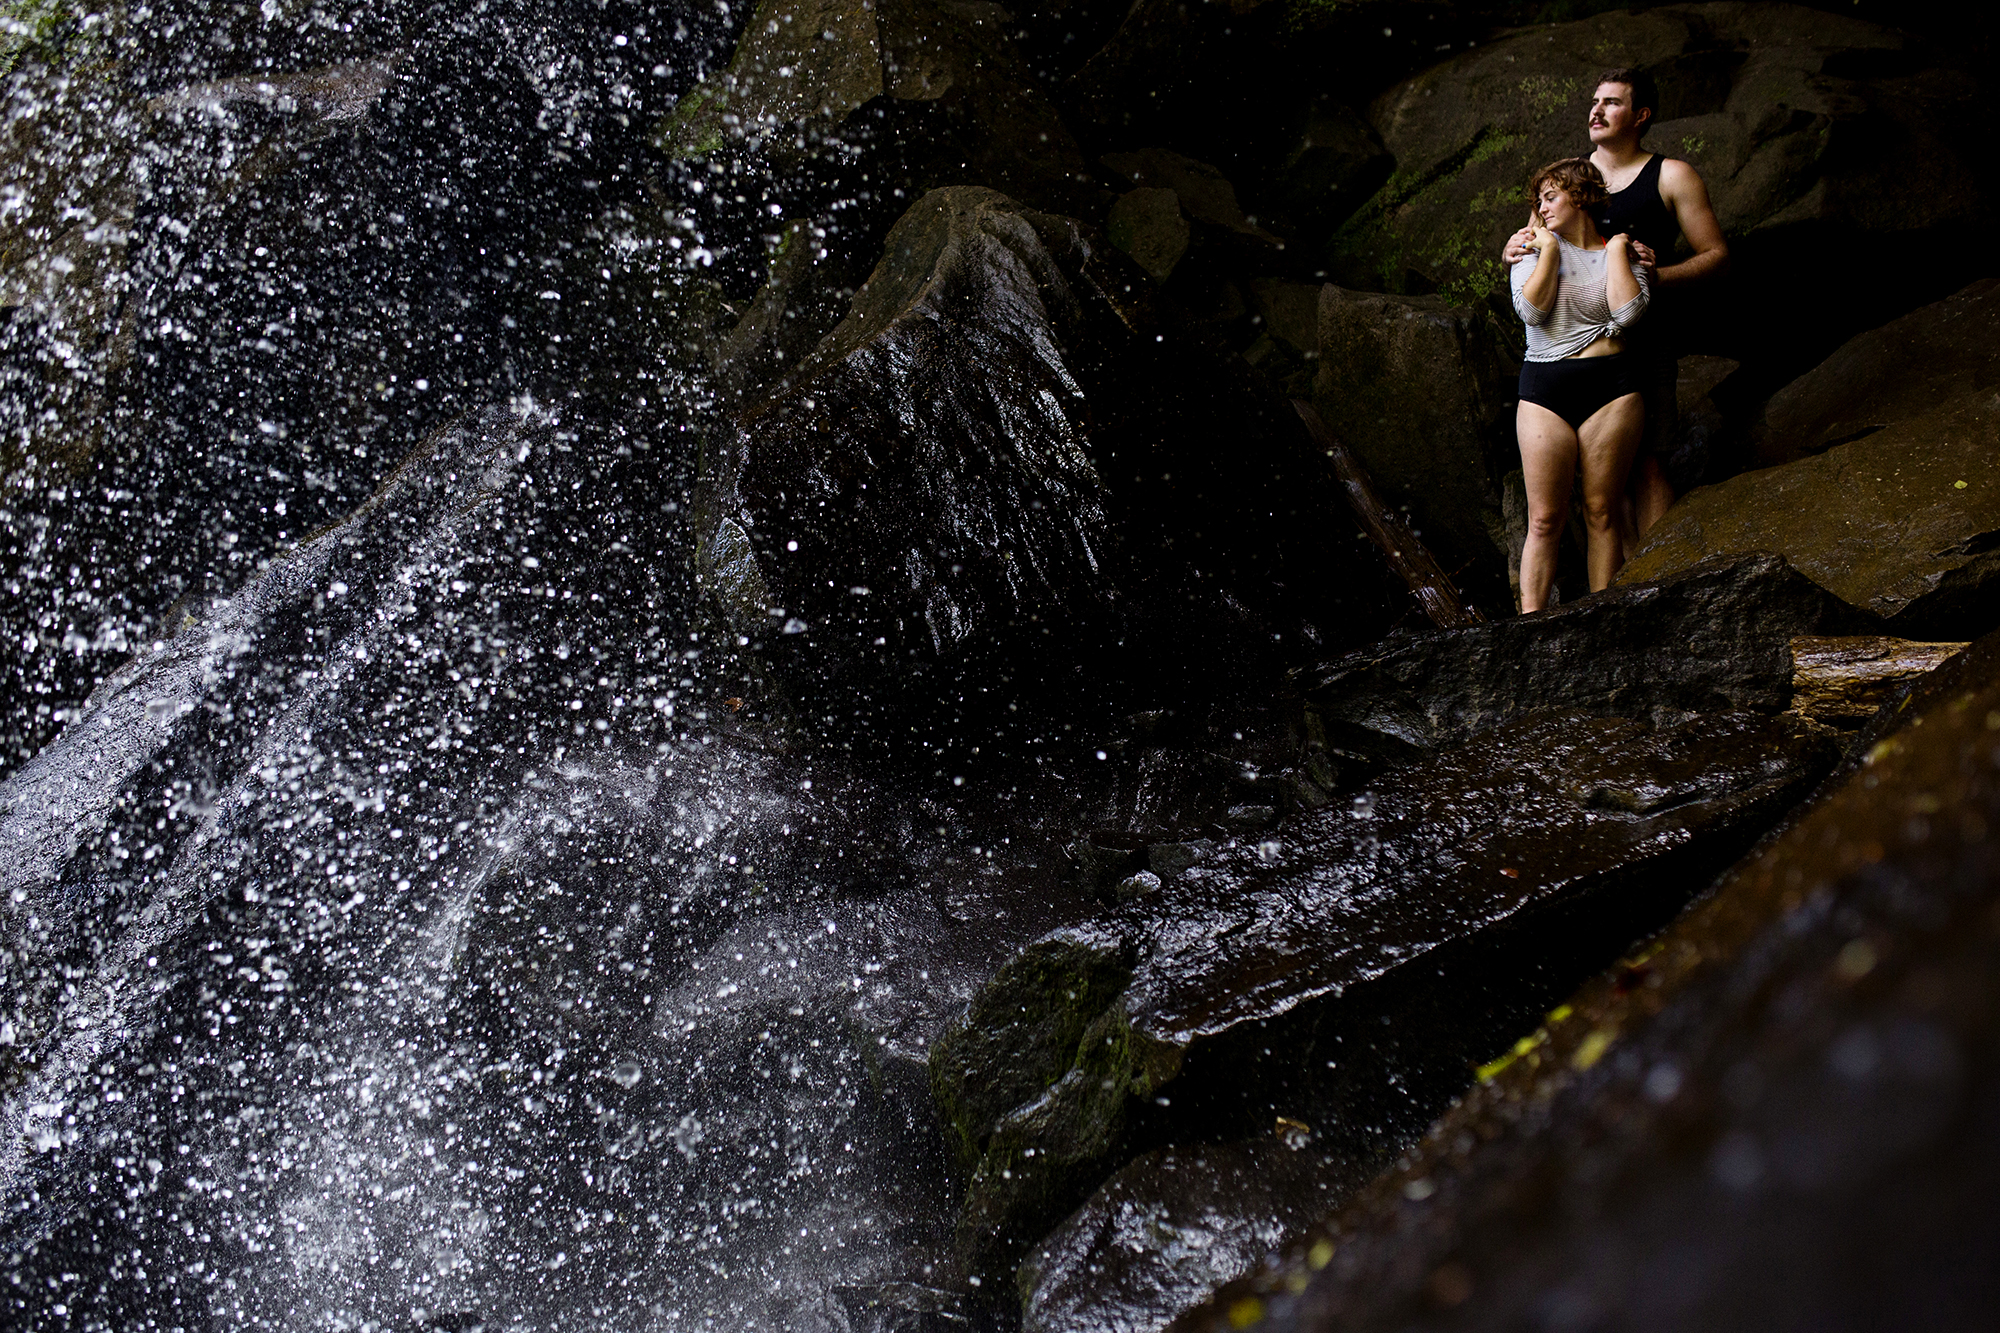 Seriously_Sabrina_Photography_Outdoor_Adventure_Engagement_Cumberland_Falls_SD16.jpg